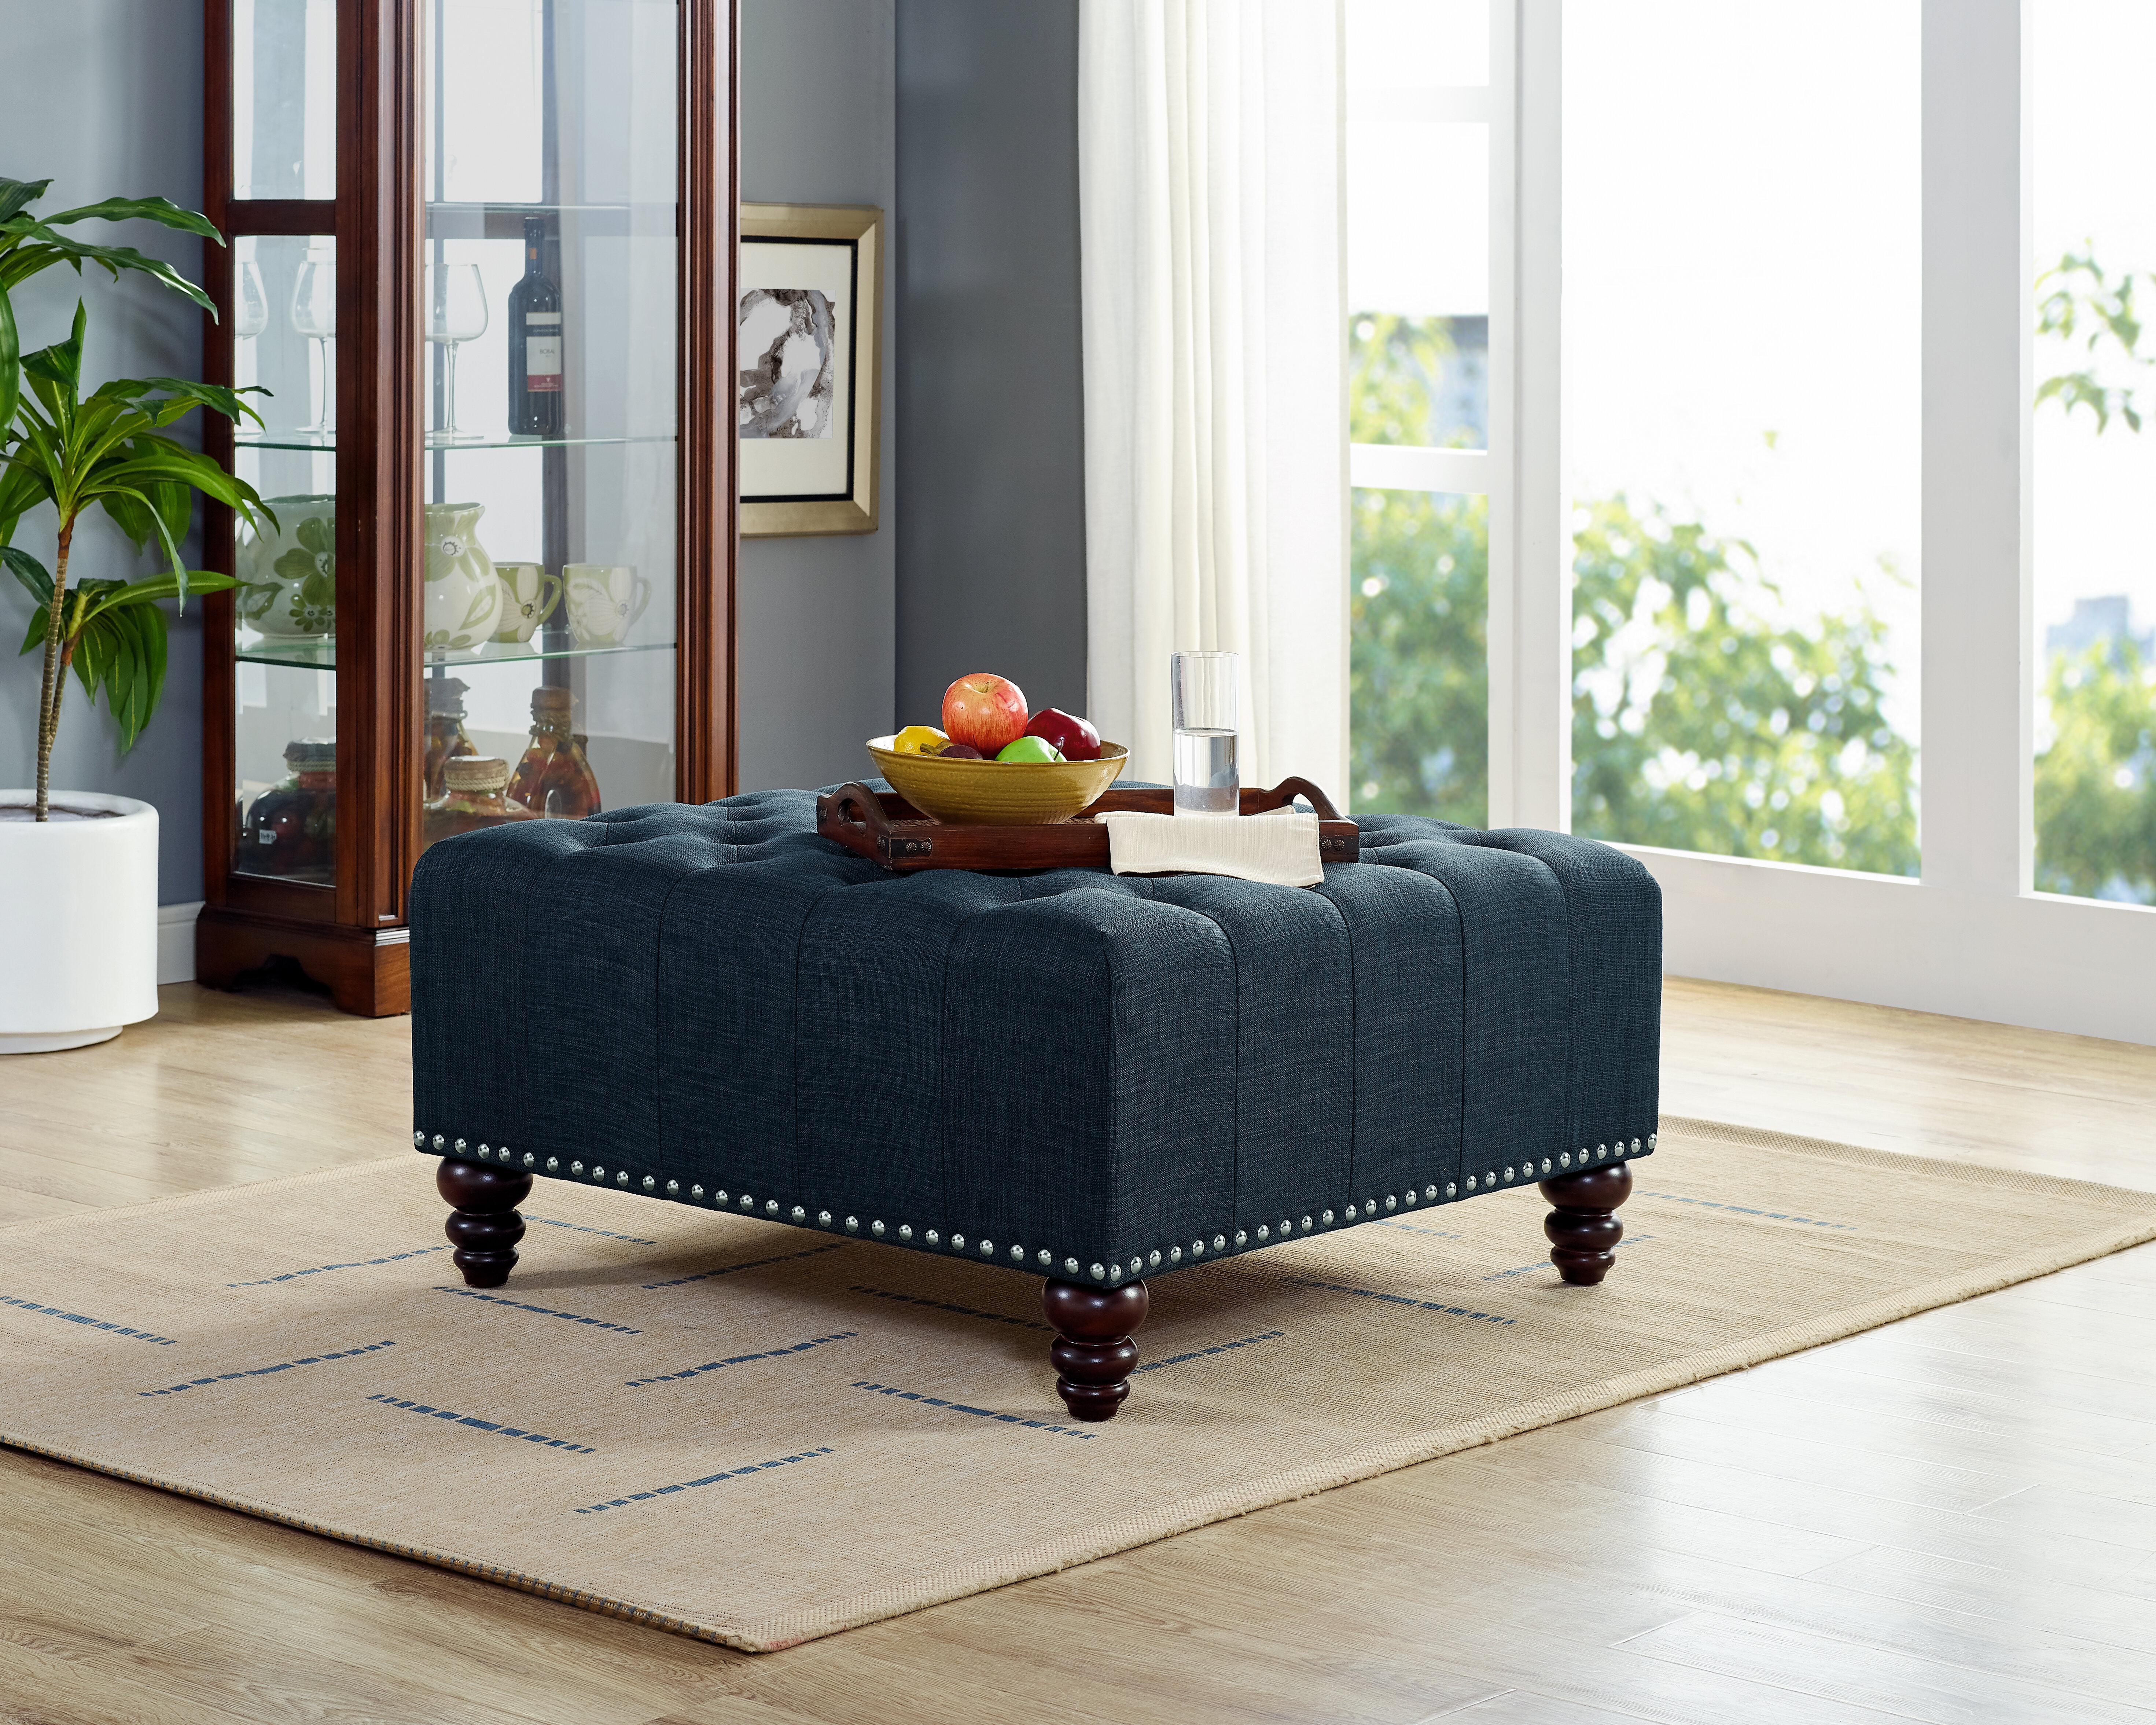 Fabulous Camarena Tufted Cocktail Ottoman Ibusinesslaw Wood Chair Design Ideas Ibusinesslaworg